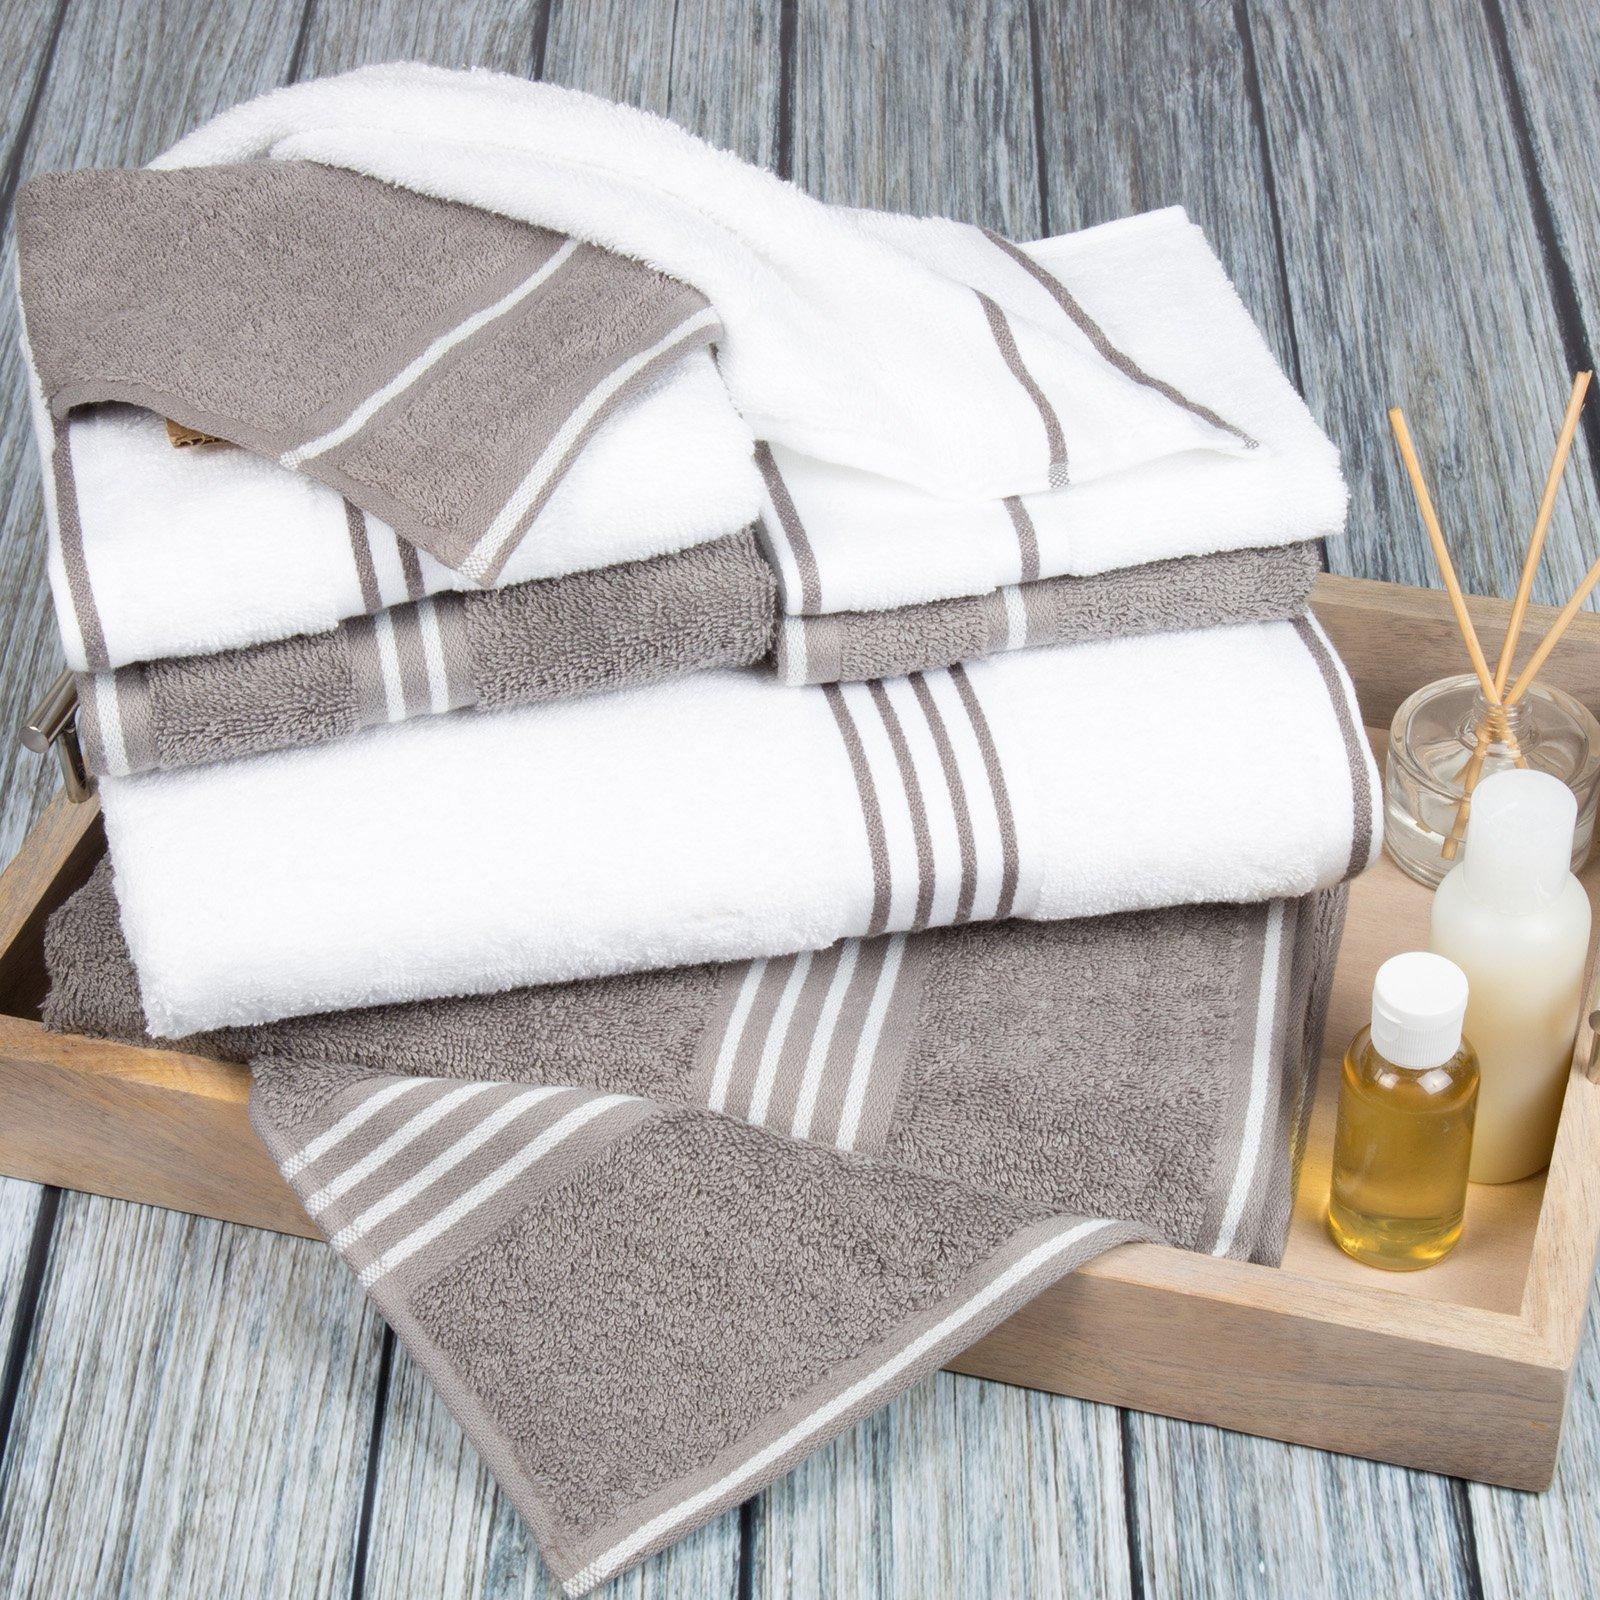 Lavish Home Rio 8 Piece Egyptian Cotton Towel Set White Silver Towel Set Egyptian Cotton Towels Cotton Bath Towels